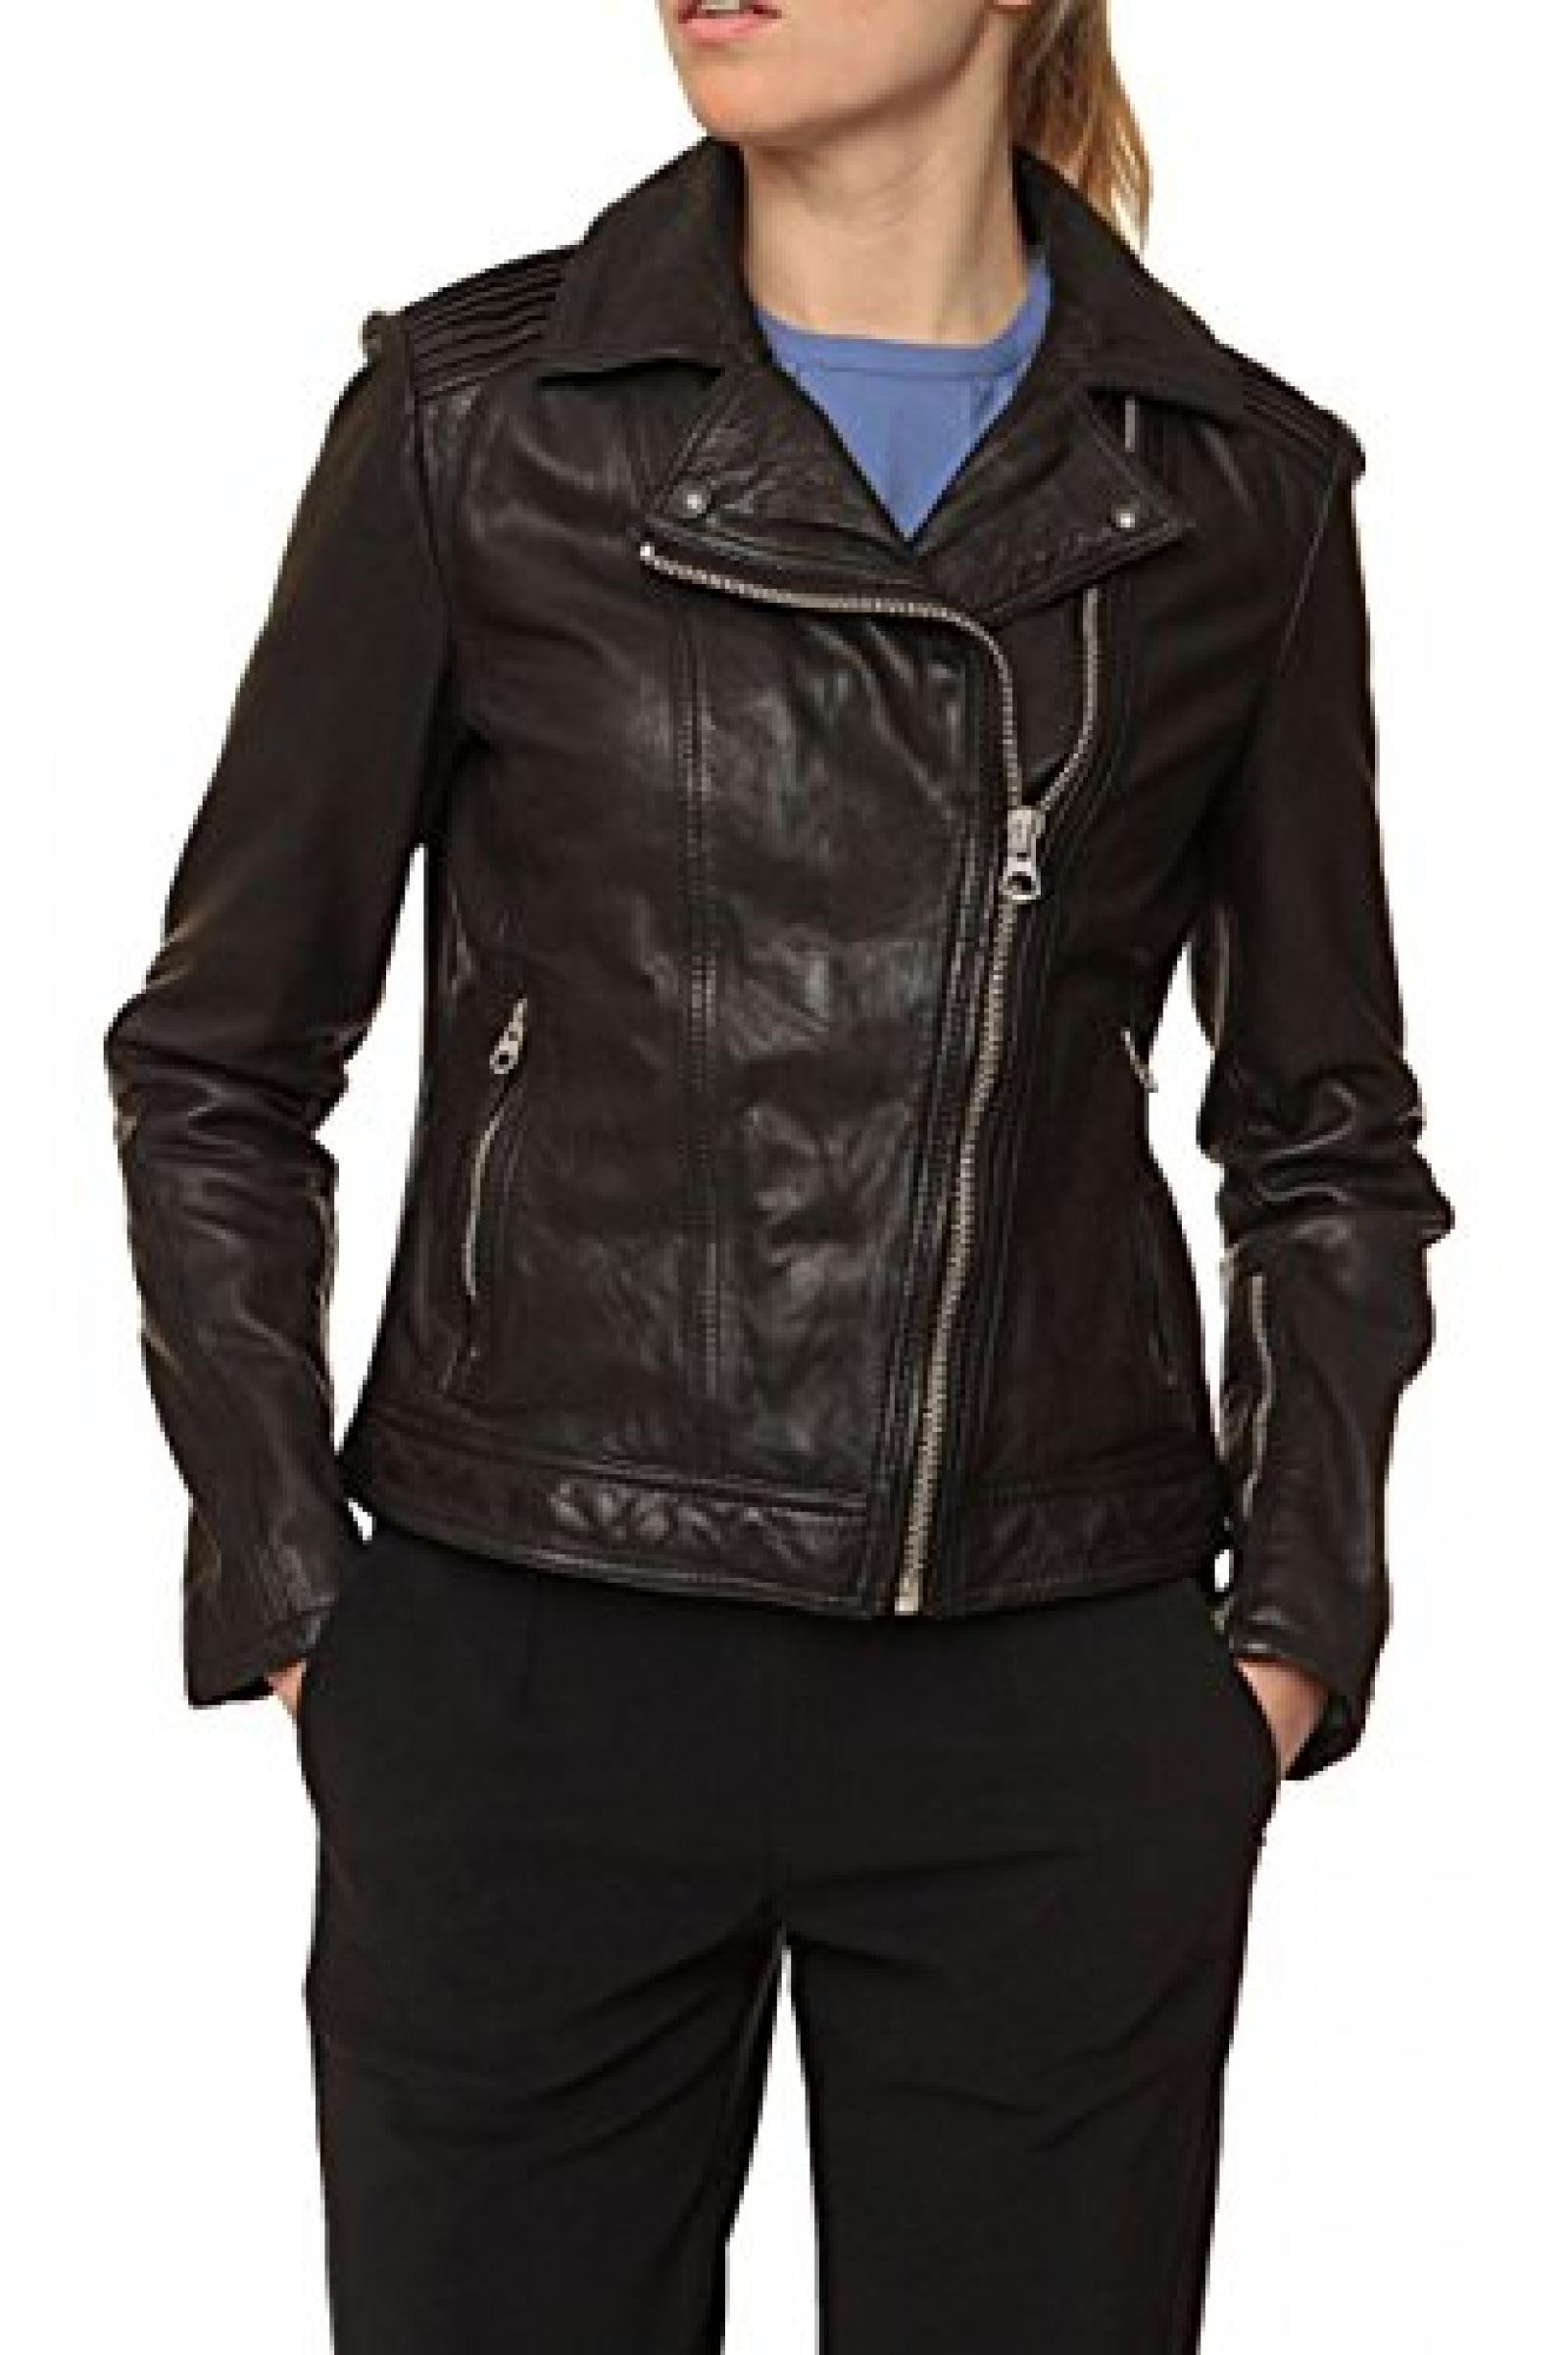 Campus Damen Jacke Lederjacke , Farbe: Schwarz